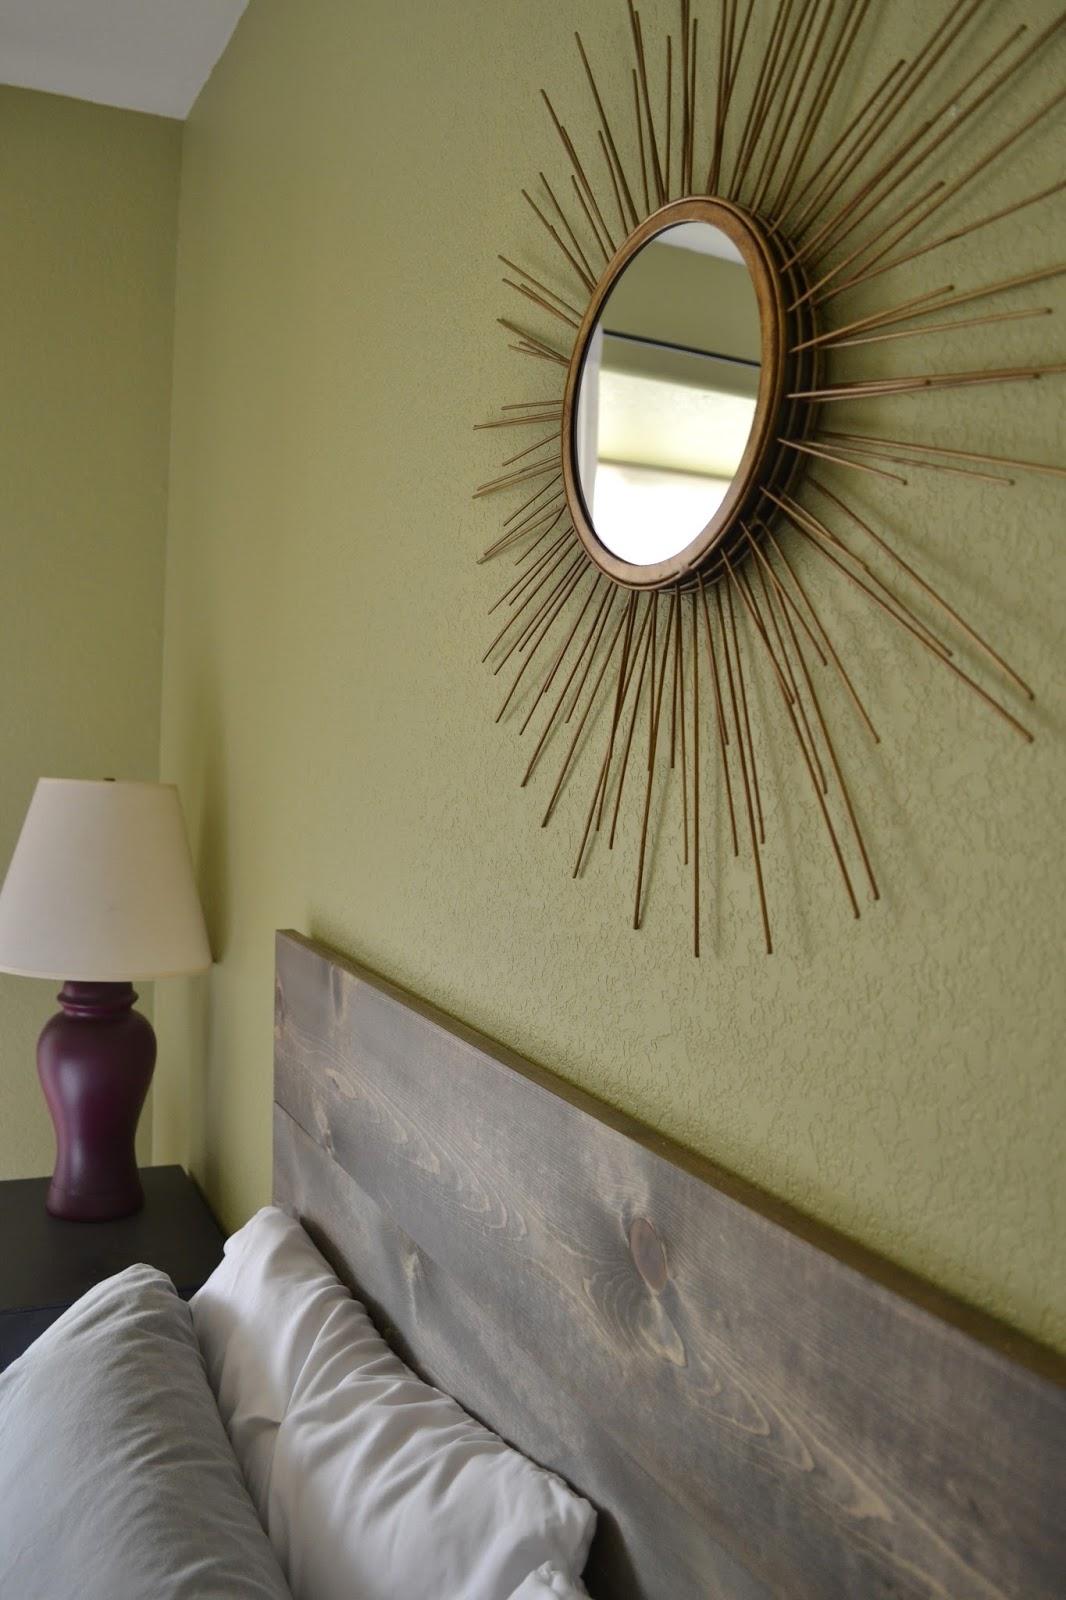 Sunburst Mirror above Headboard